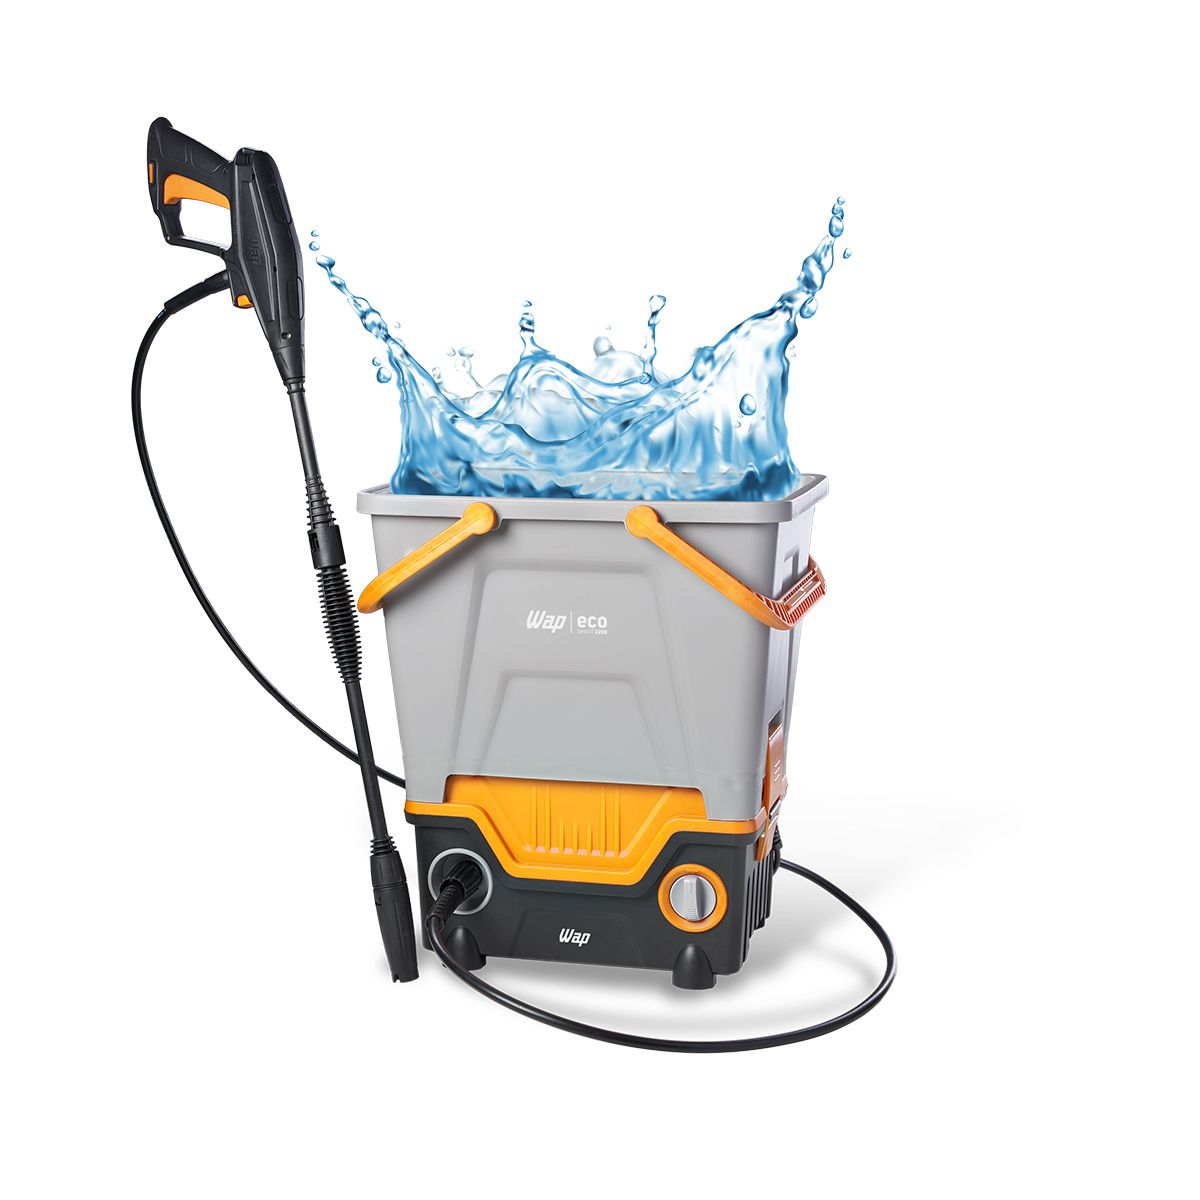 Eco Smart 2200 Ultra Para Águas Reutilizáveis  23L Wap